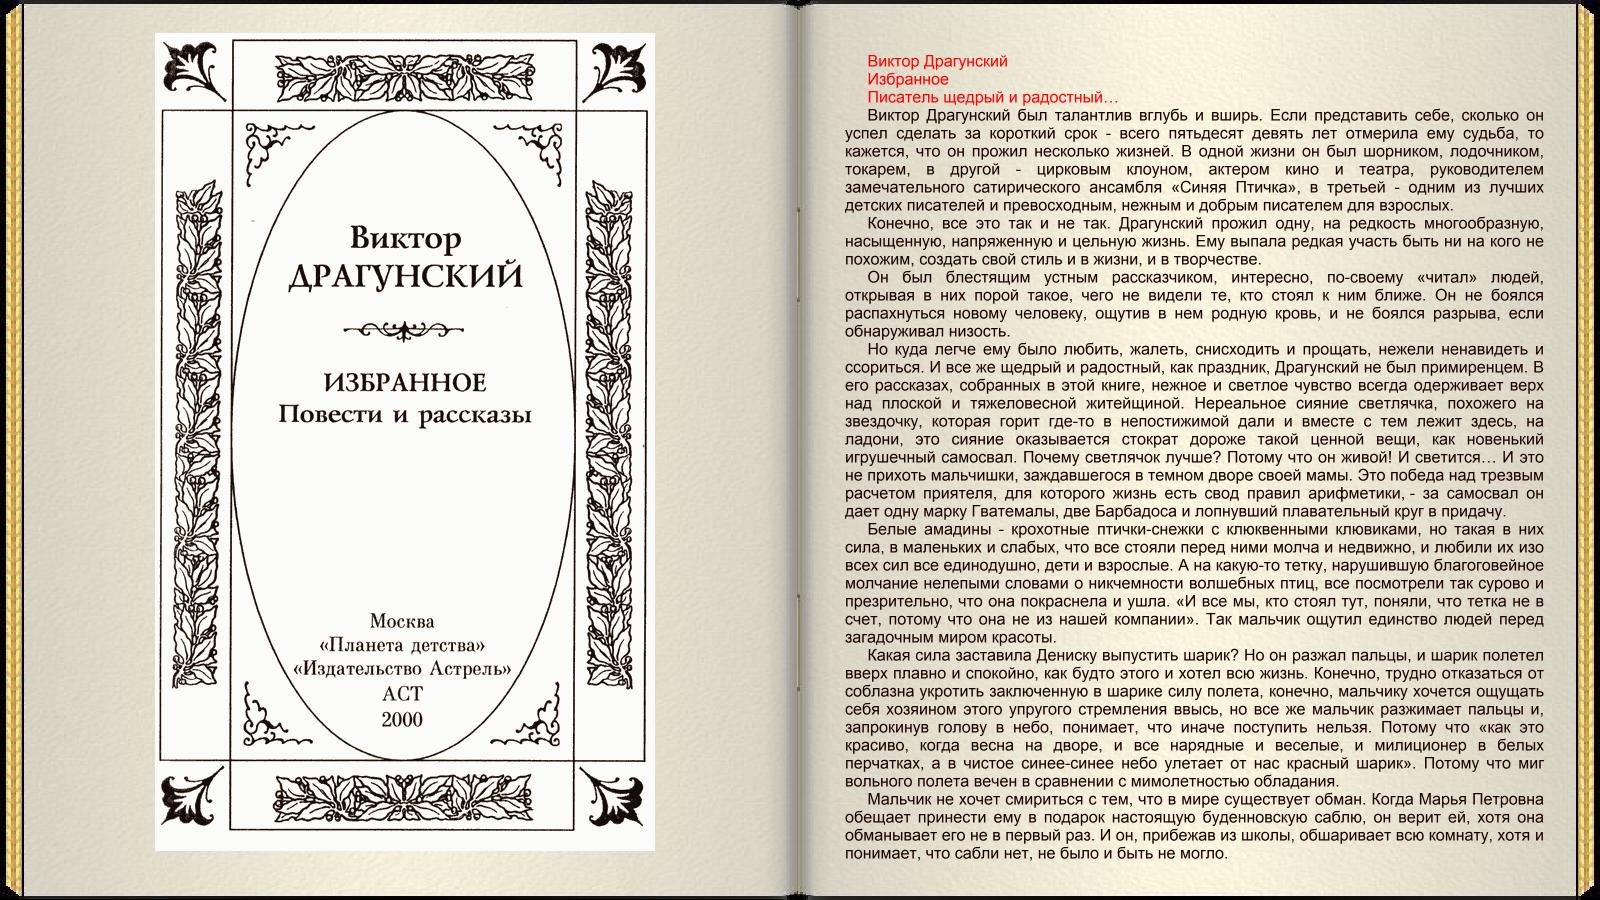 http://i1.imageban.ru/out/2016/01/30/1ad3cb5e13e0a4b27fdddbc31ff2d6ff.jpg